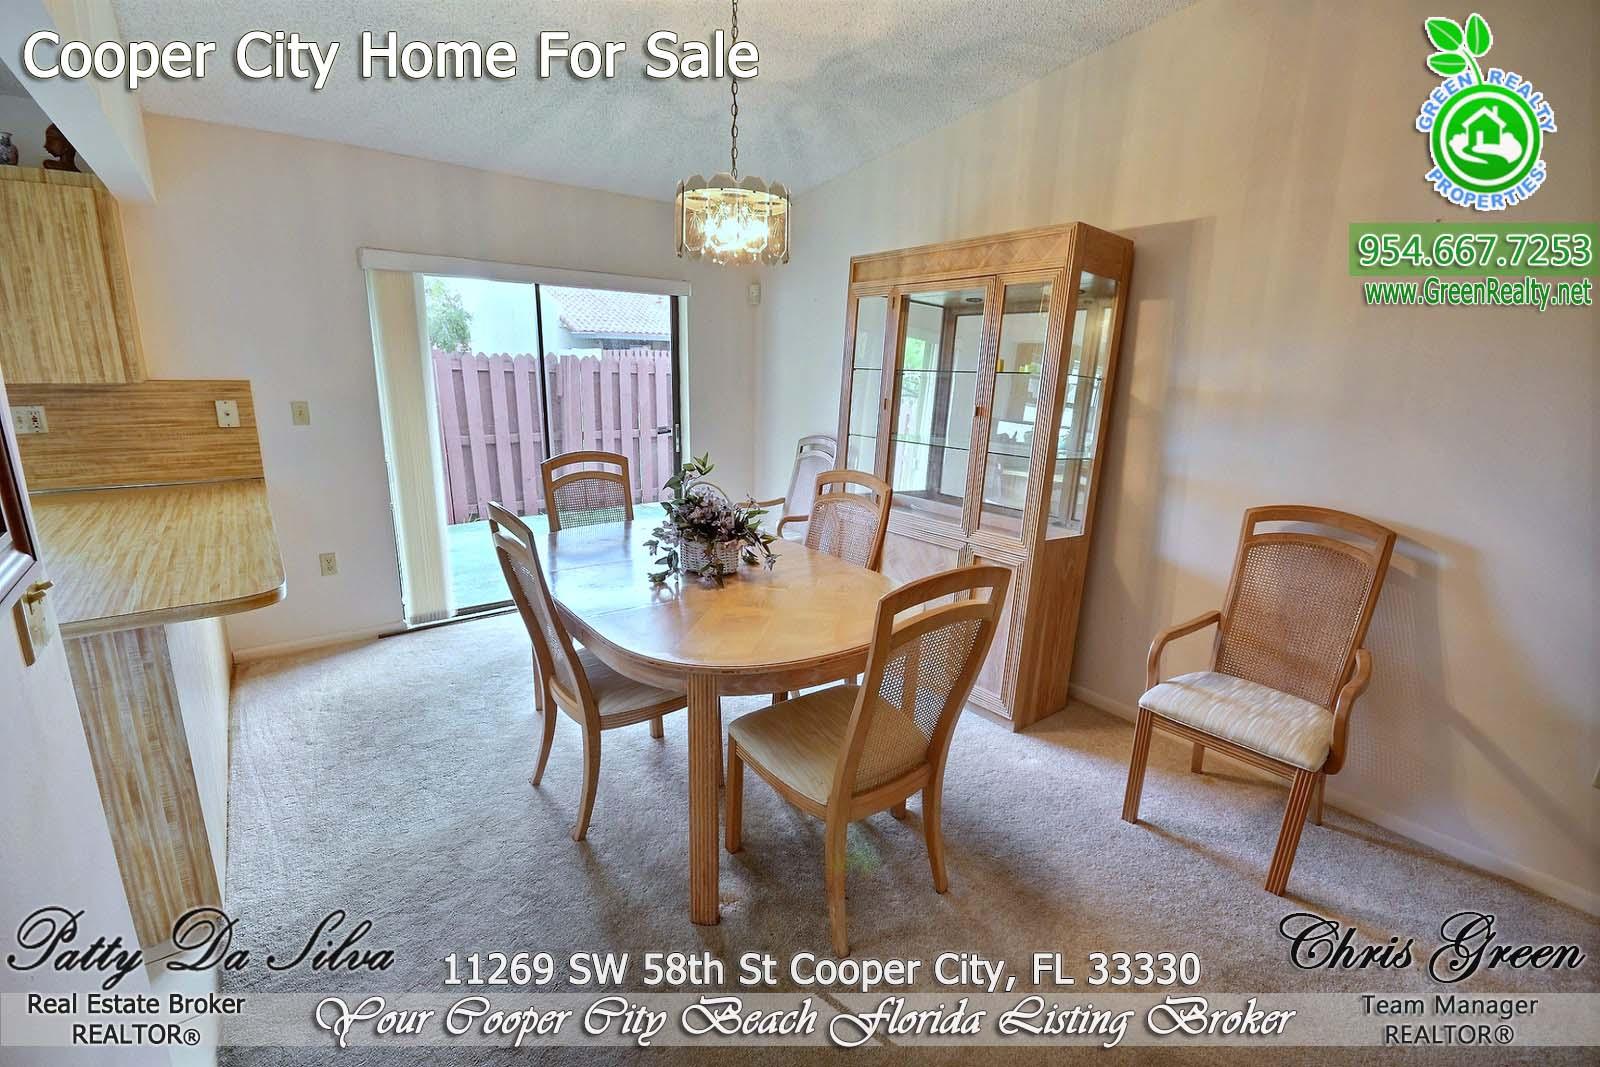 8 Cooper City Real Estate - Villas (13)